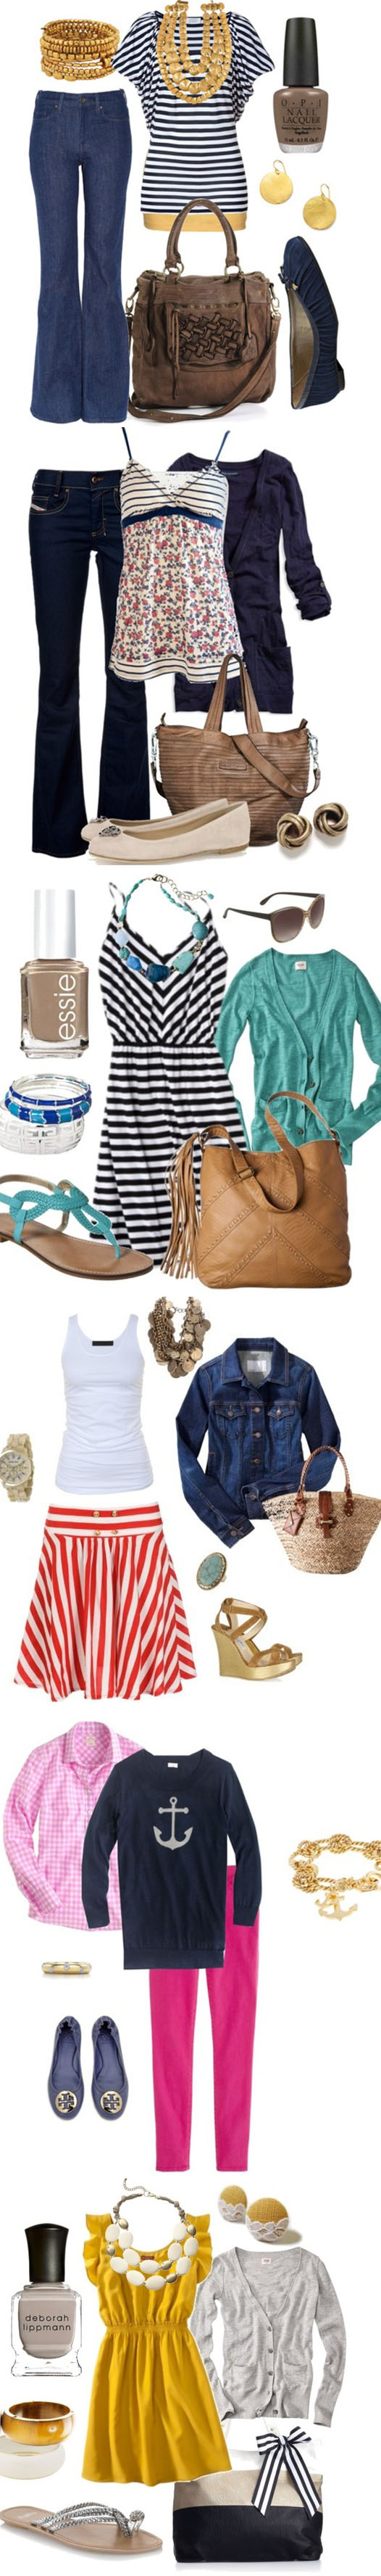 Nautical Spring Fashion 2013